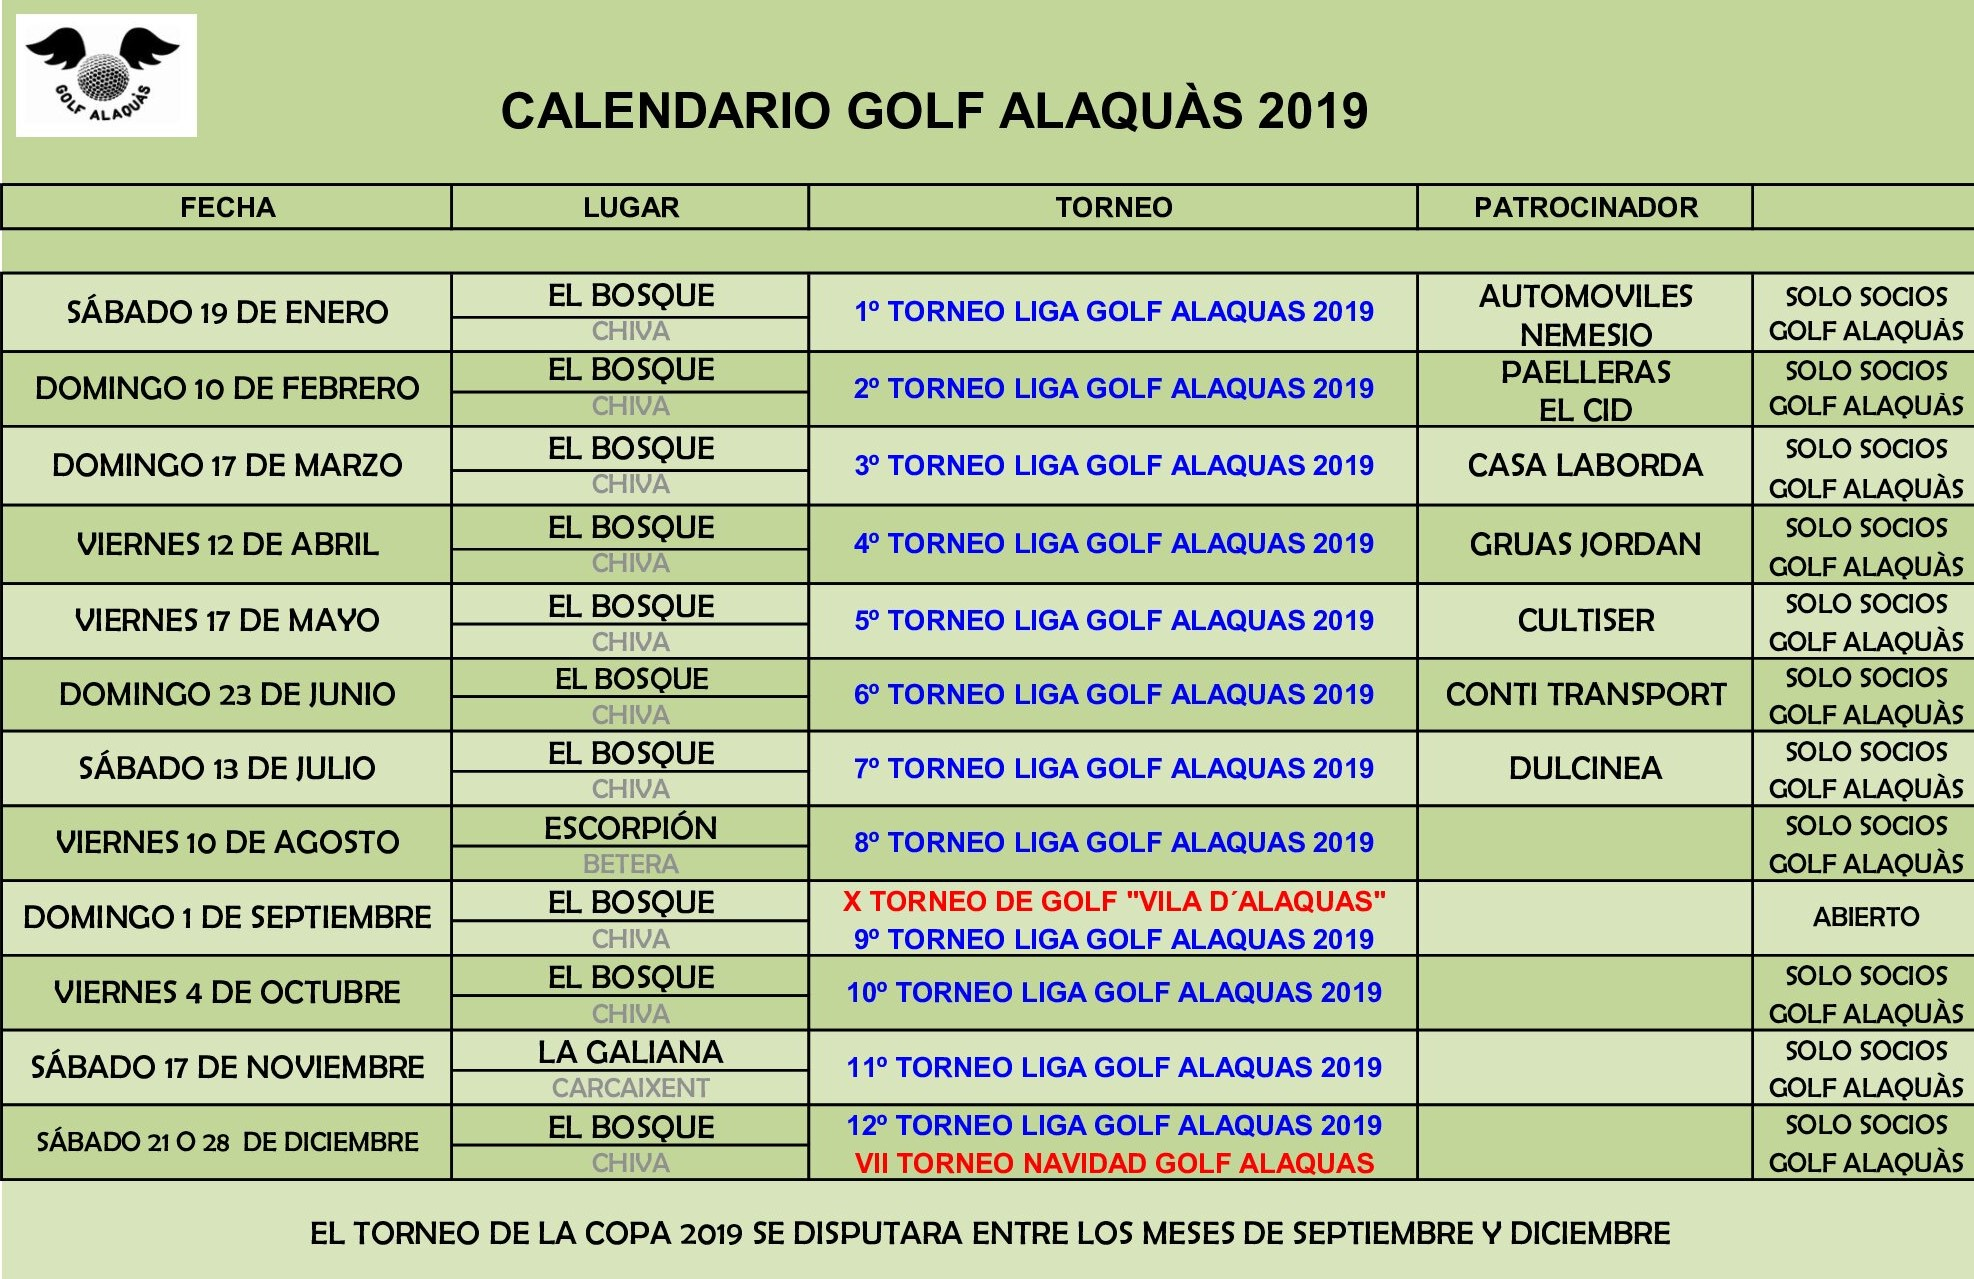 CALENDARIO GOLF ALAQUAS 2019